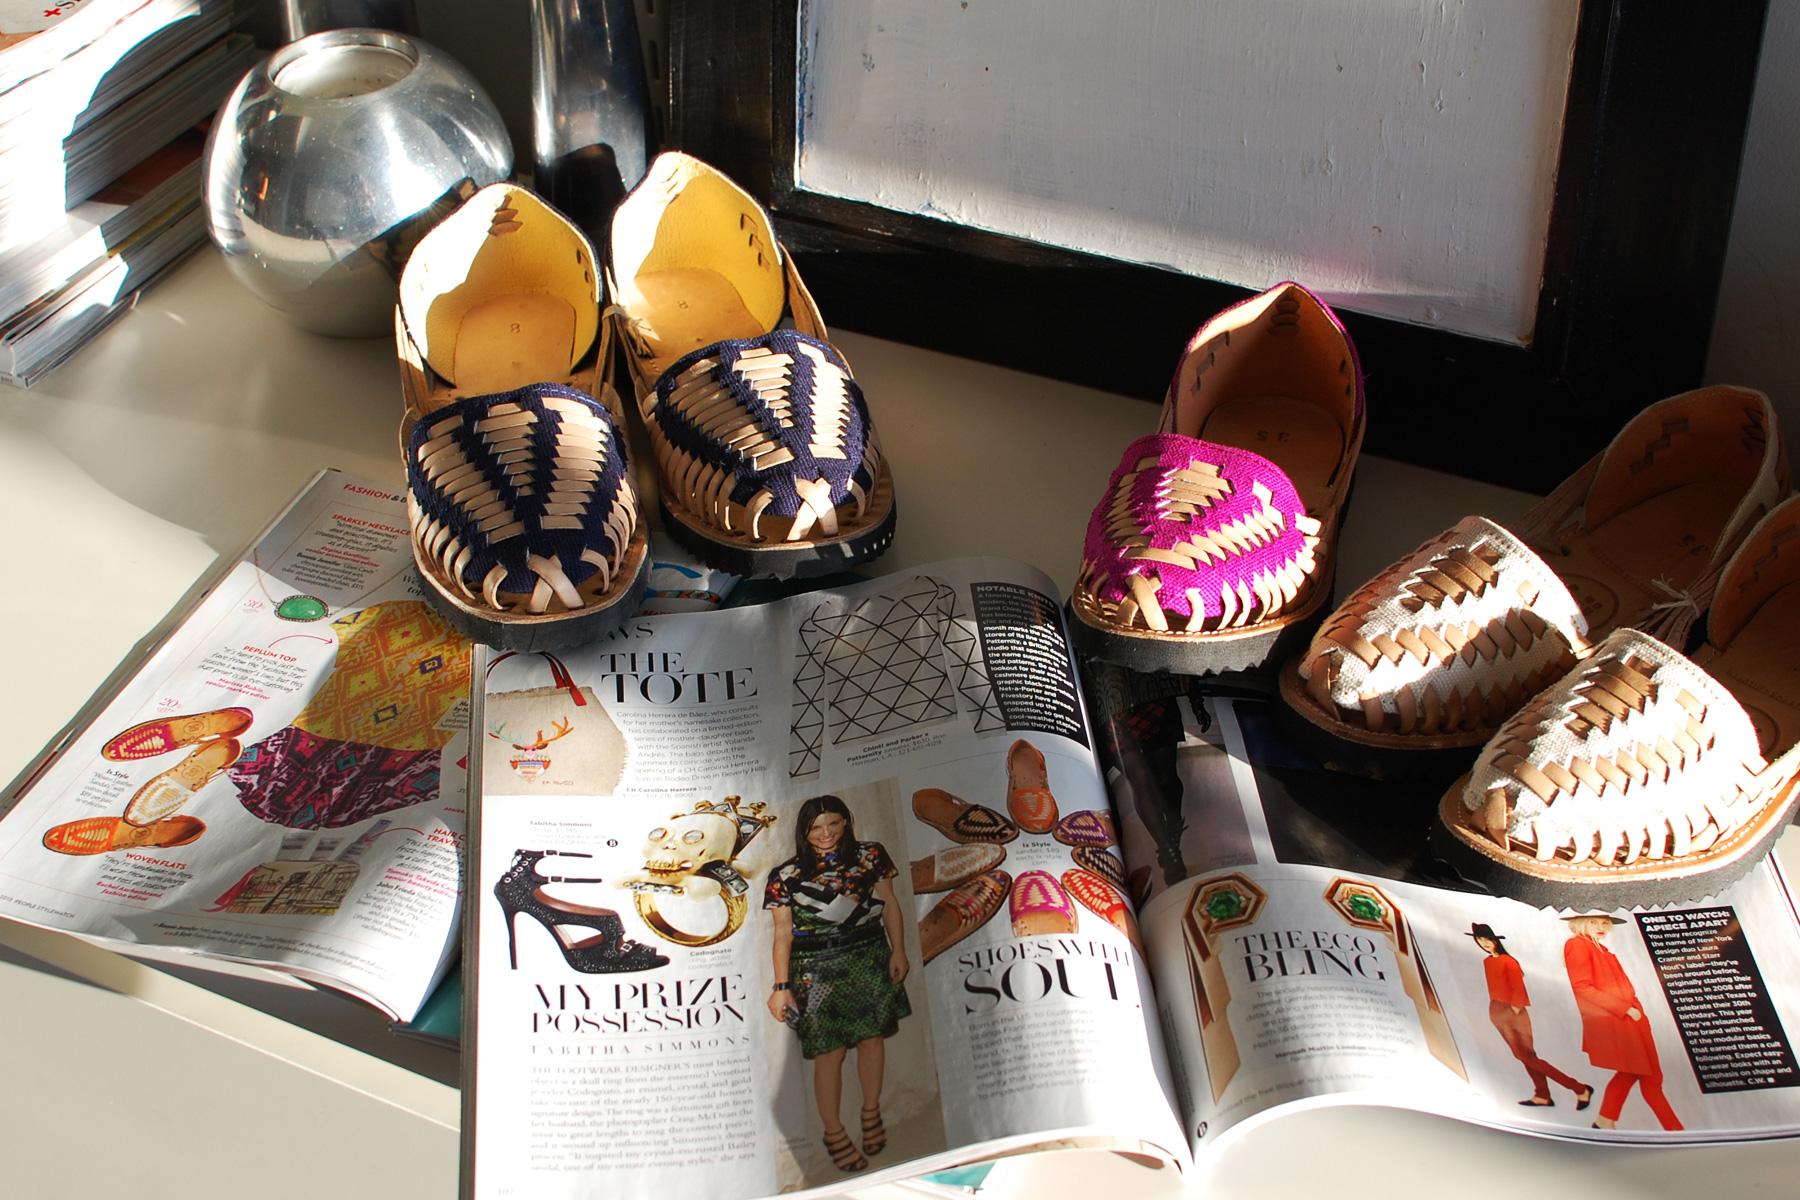 IX Style in Harper's Bazaar and People Magazine